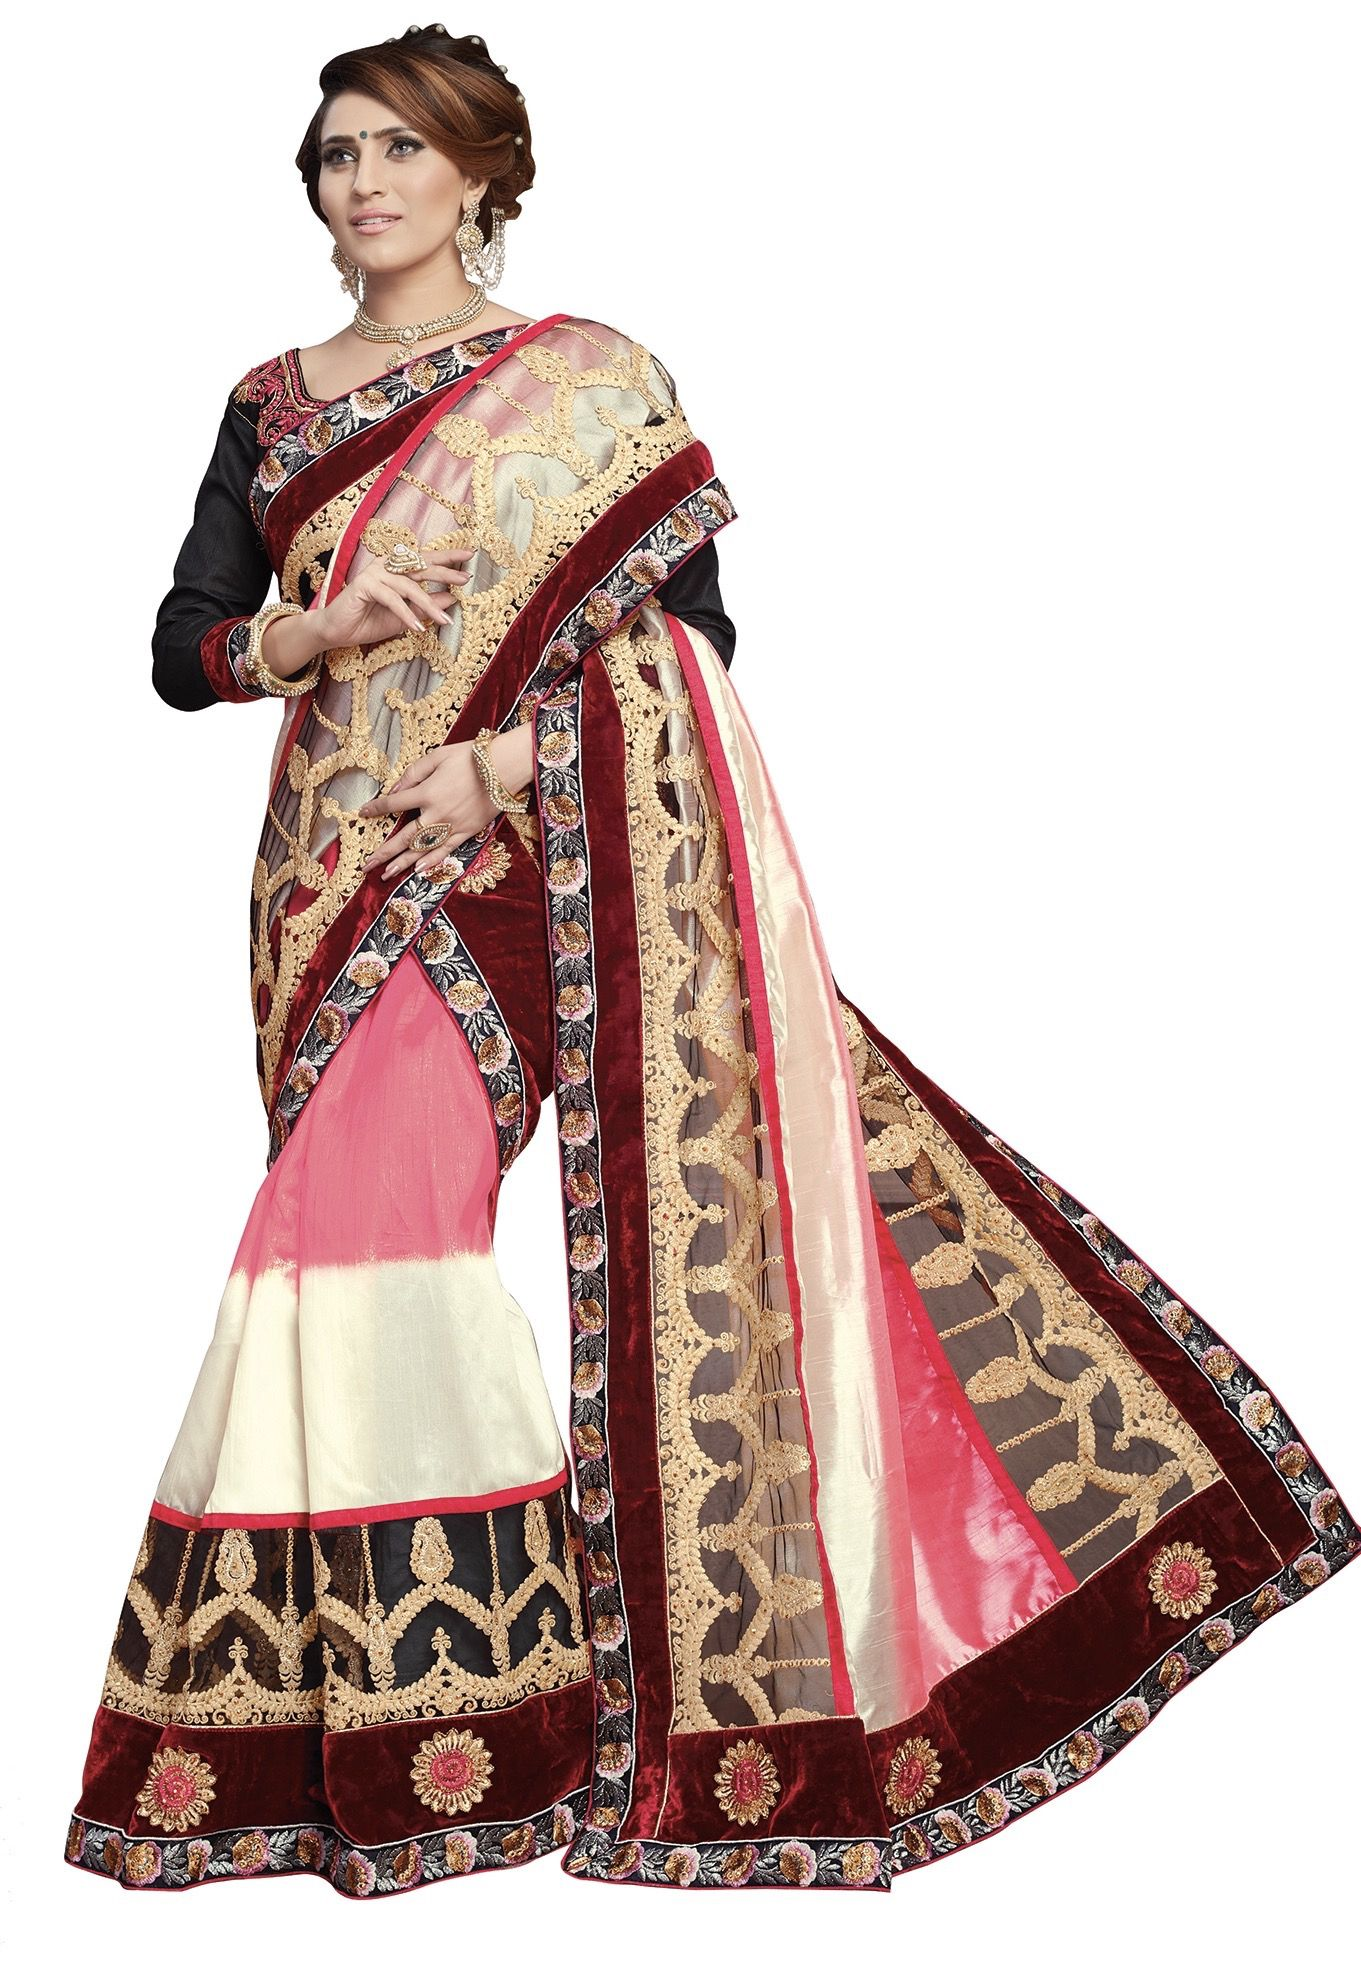 S. Kiran's Multicoloured Art Silk Mekhela Chador Saree